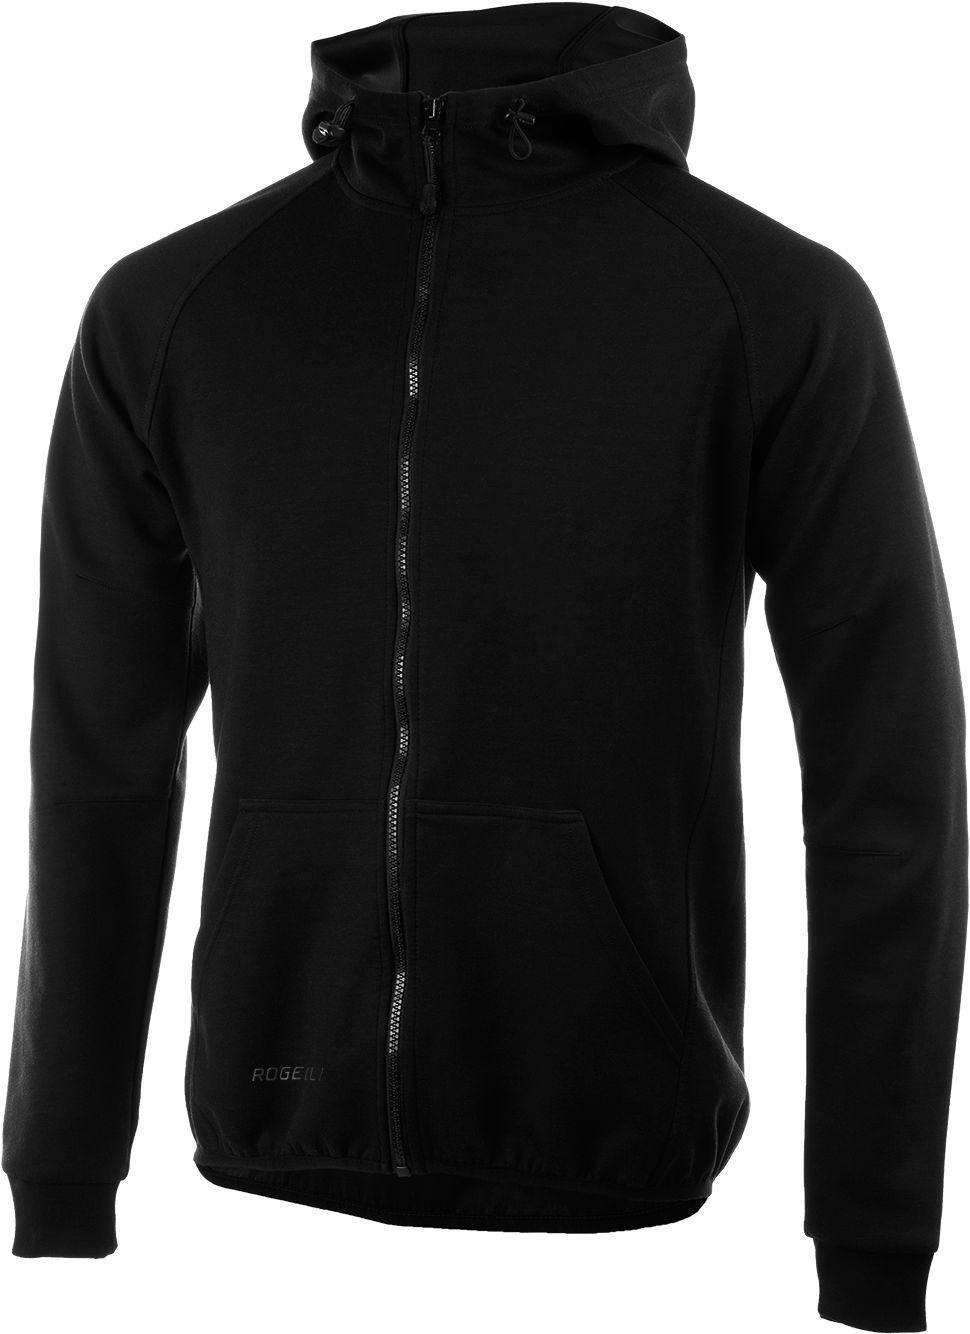 ROGELLI bluza męska z kapturem TRENING czarna Rozmiar: 2XL,050.601.XL